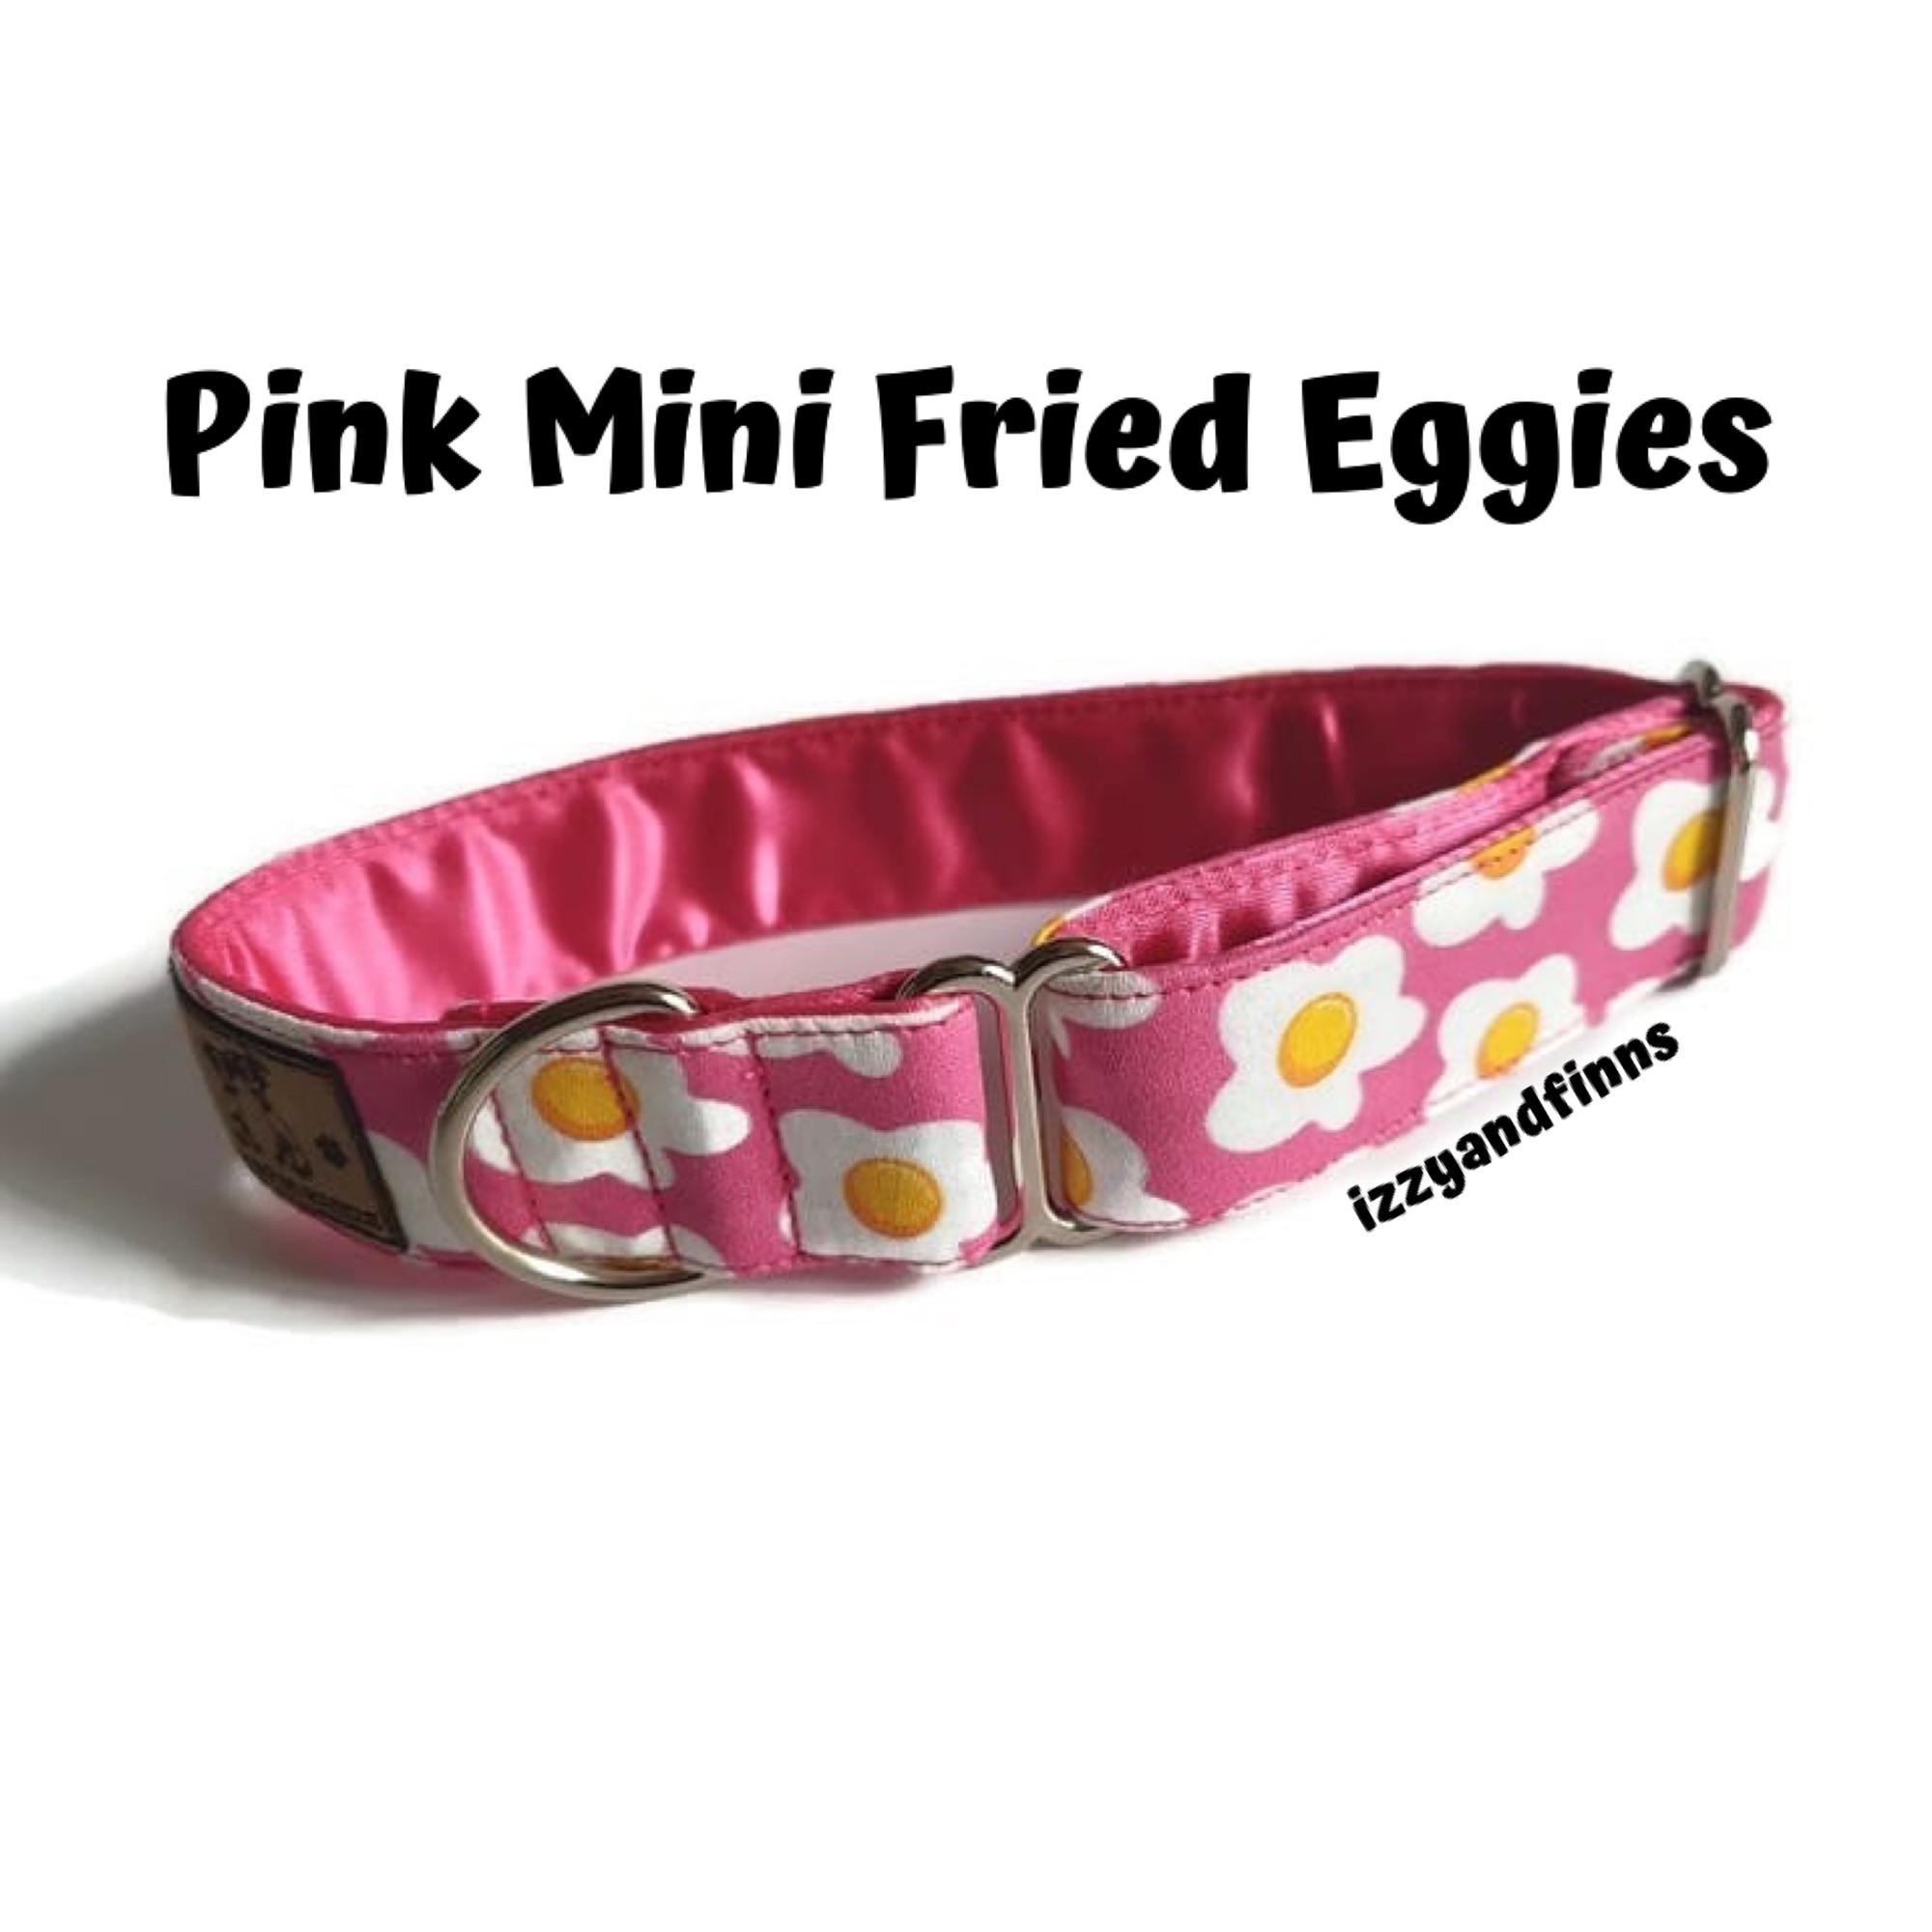 Pink Mini Fried Eggies